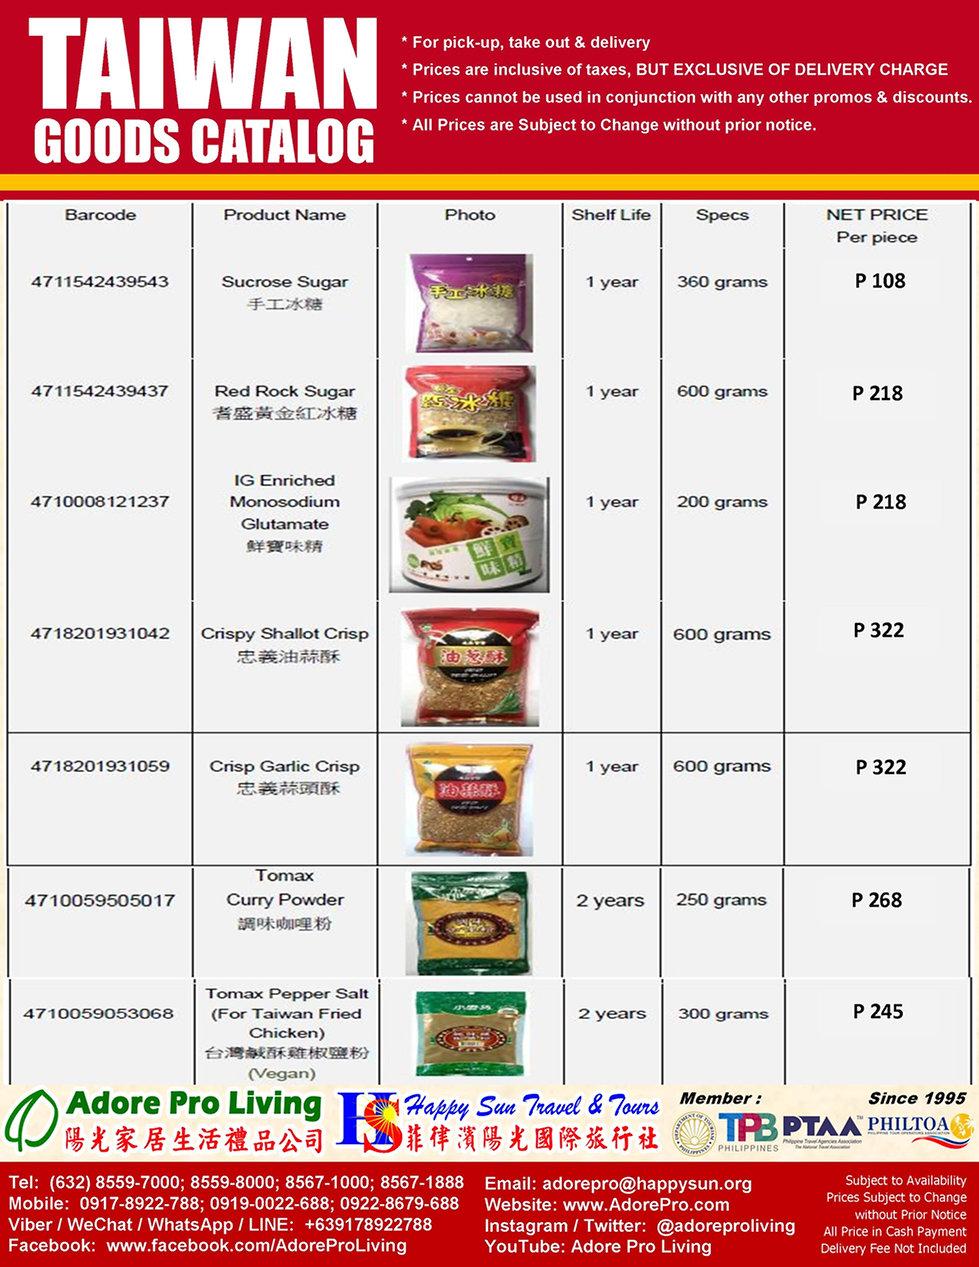 P18_Taiwan Goods Catalog_202009119.jpg